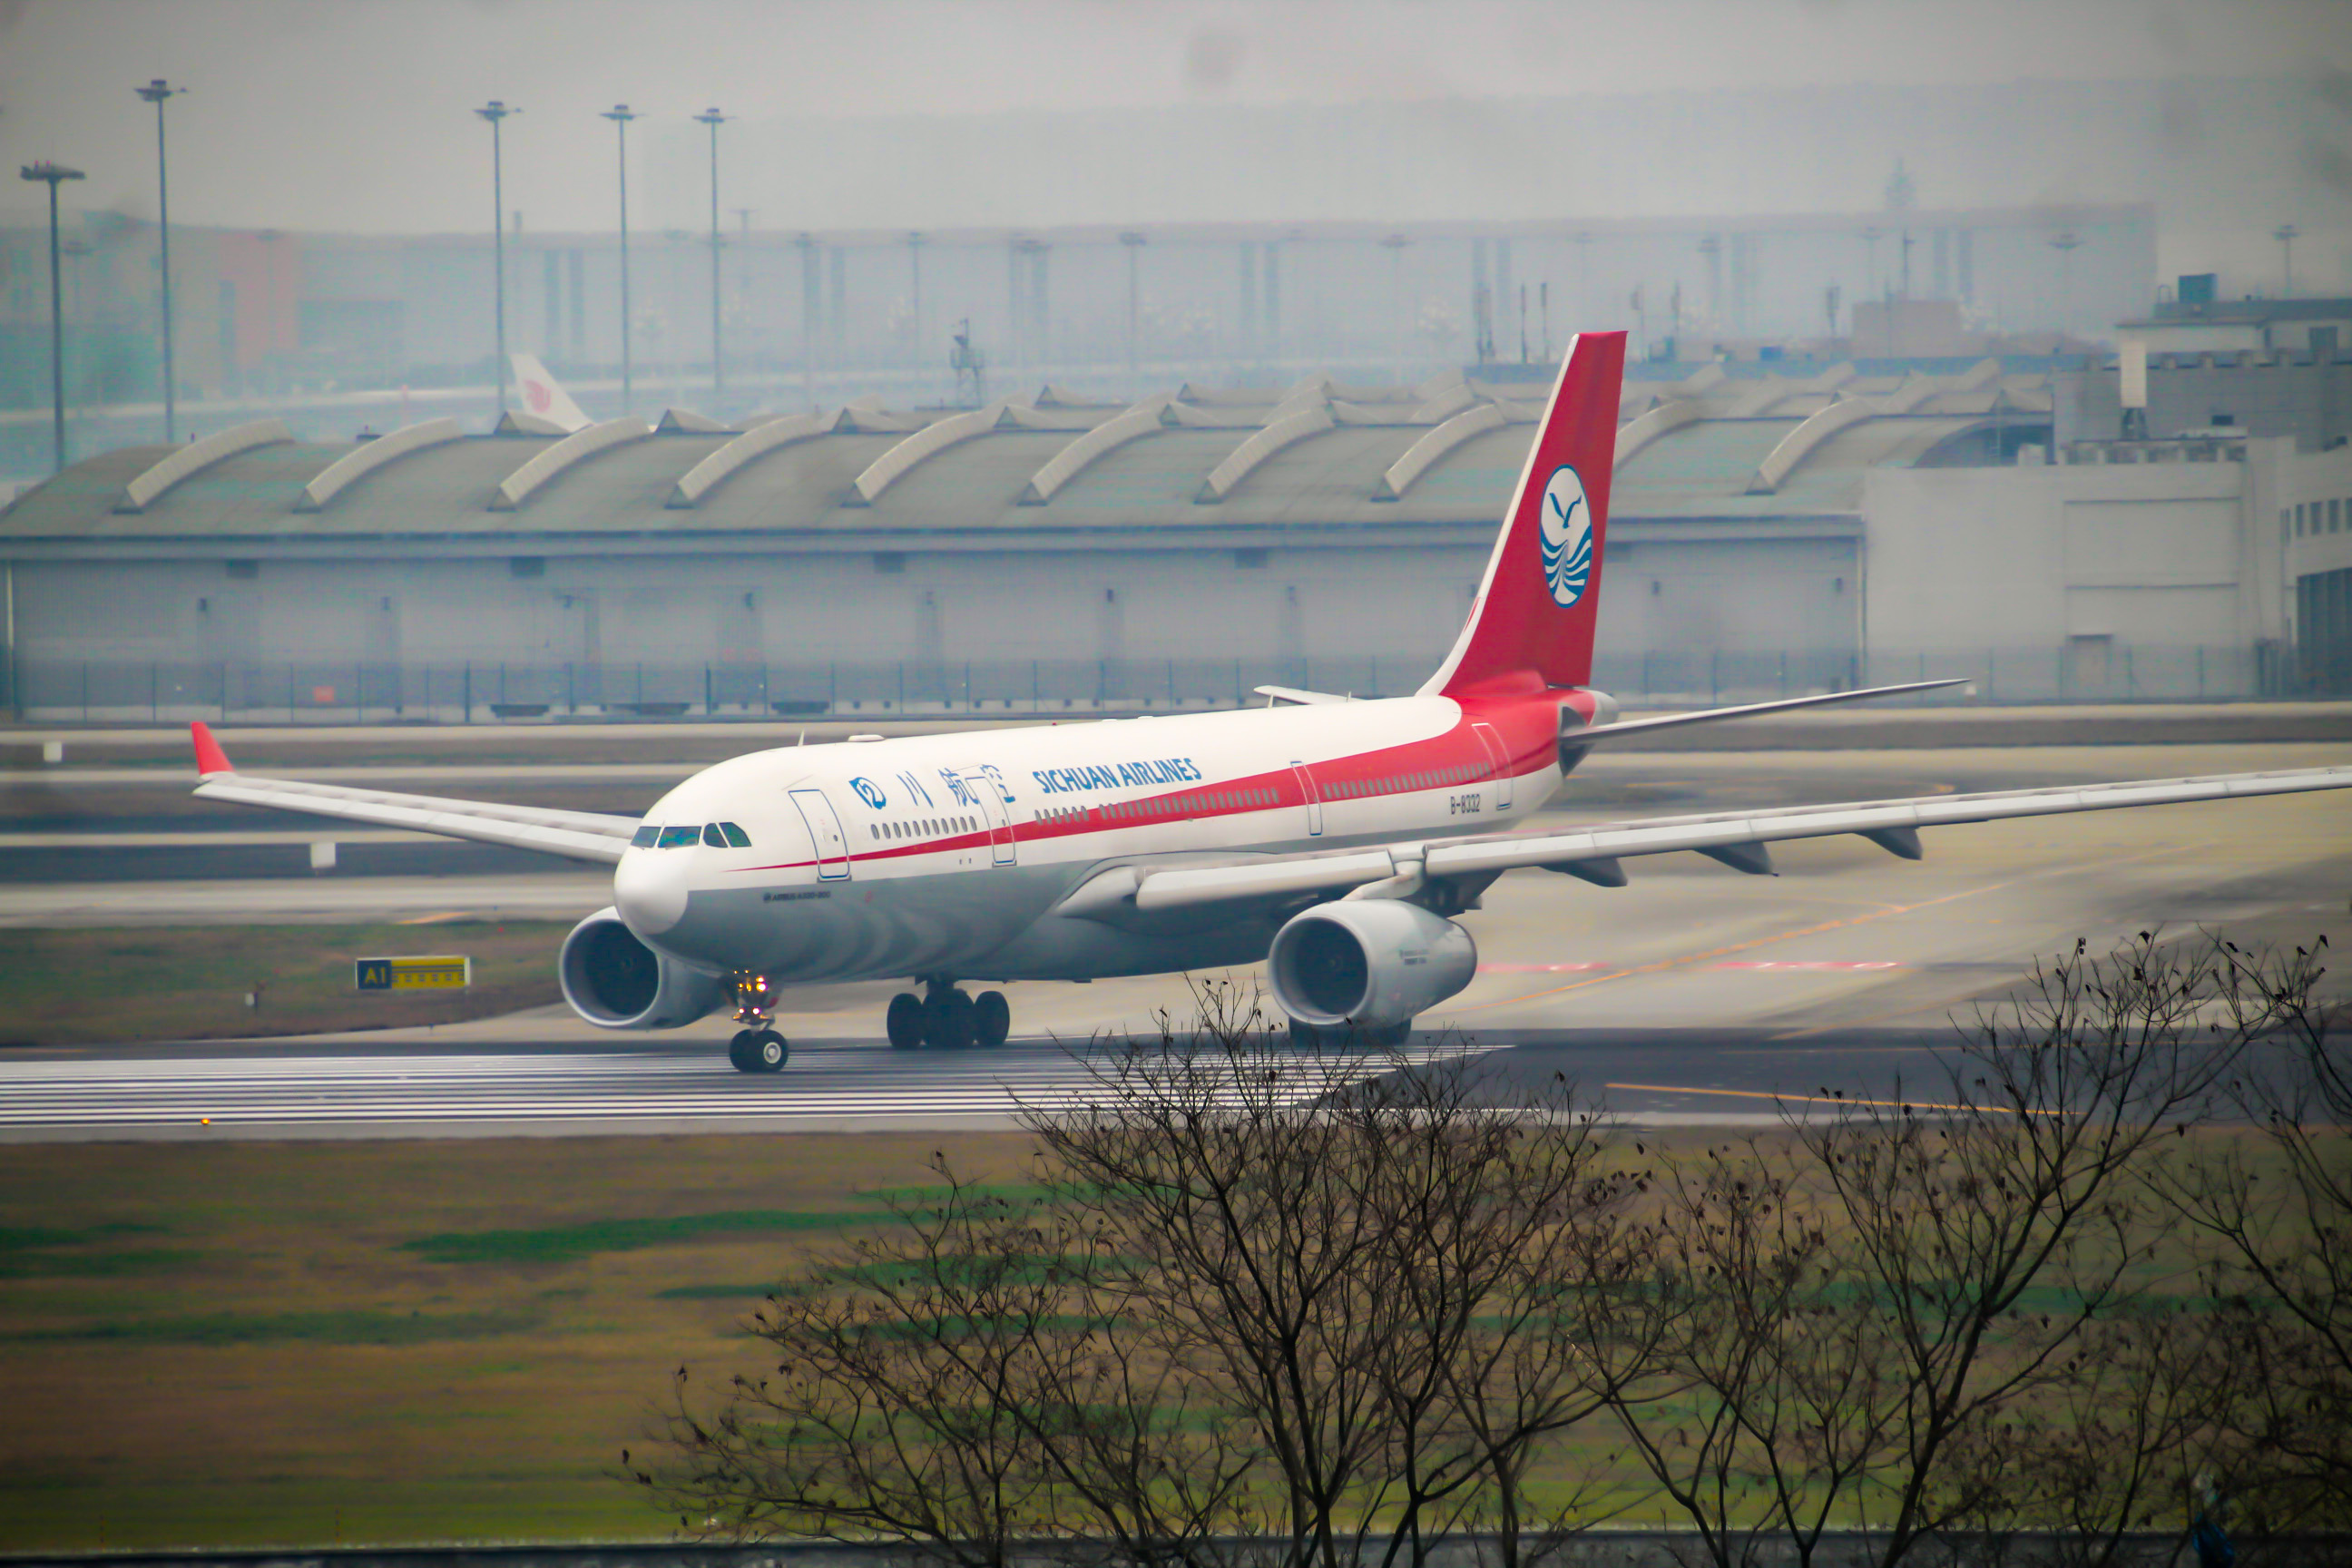 Re:[原创]CTU水泥天拍机,验证烂天好货的铁律 AIRBUS A330-200 B-8332 中国成都双流国际机场